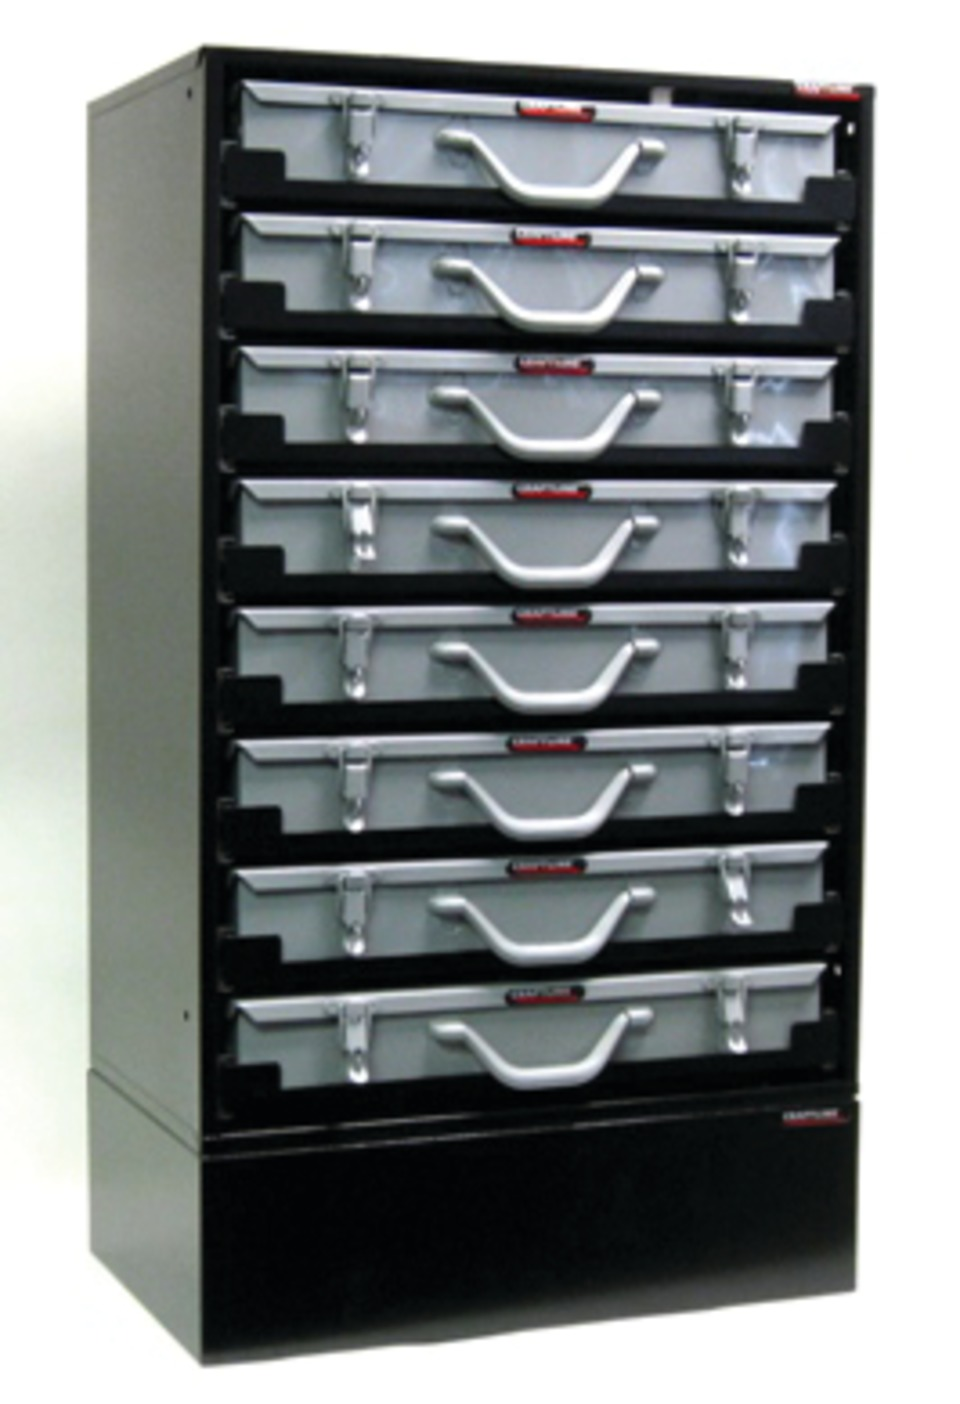 Craftline Storage Systems 8 Drawer Service Tray Rack